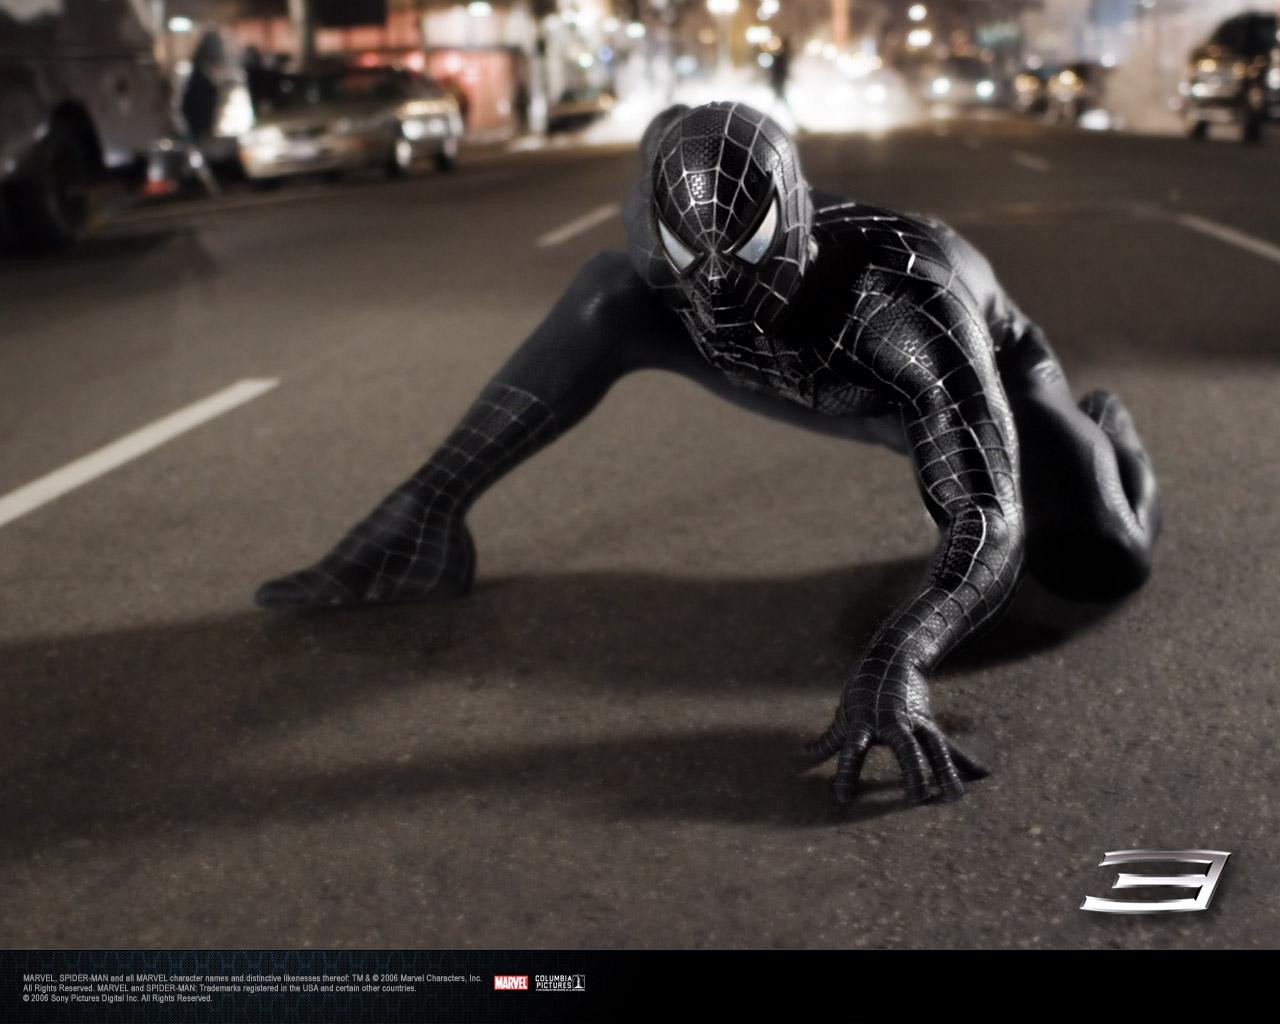 81340976a Free Download Windows 8 Themes: Black Spiderman 3 Theme | Man of Steel